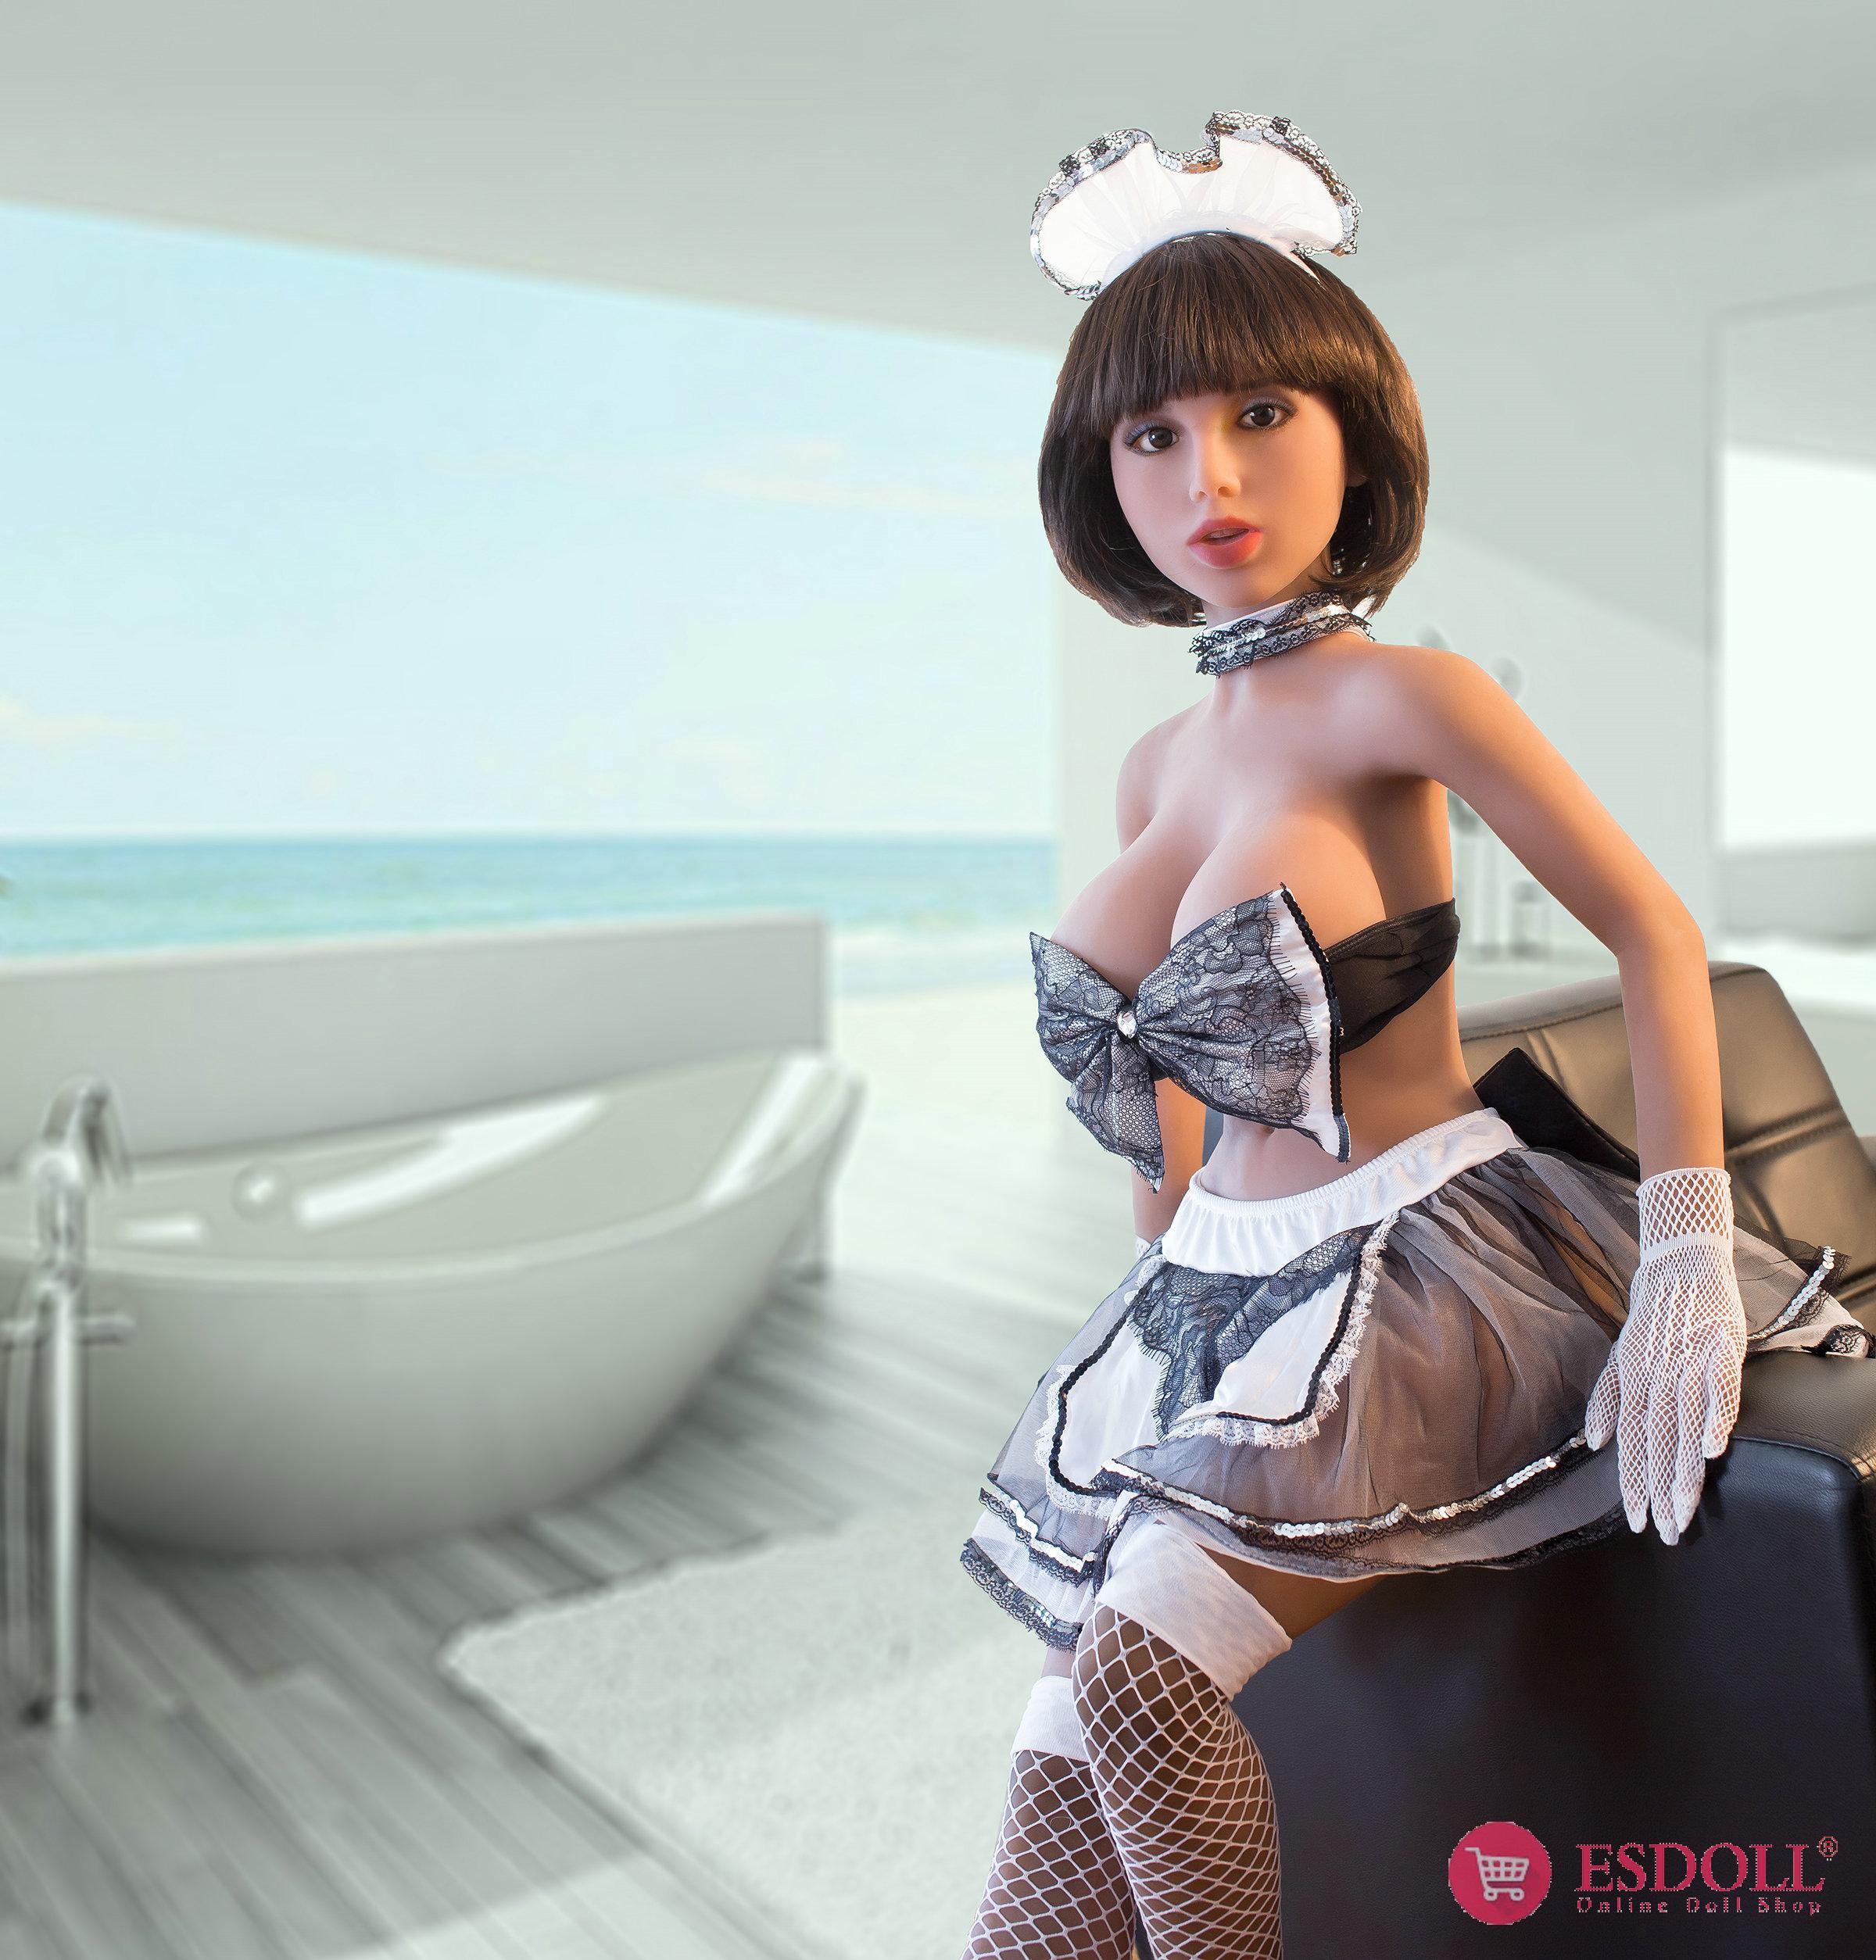 140CM Lolita sex doll - 7